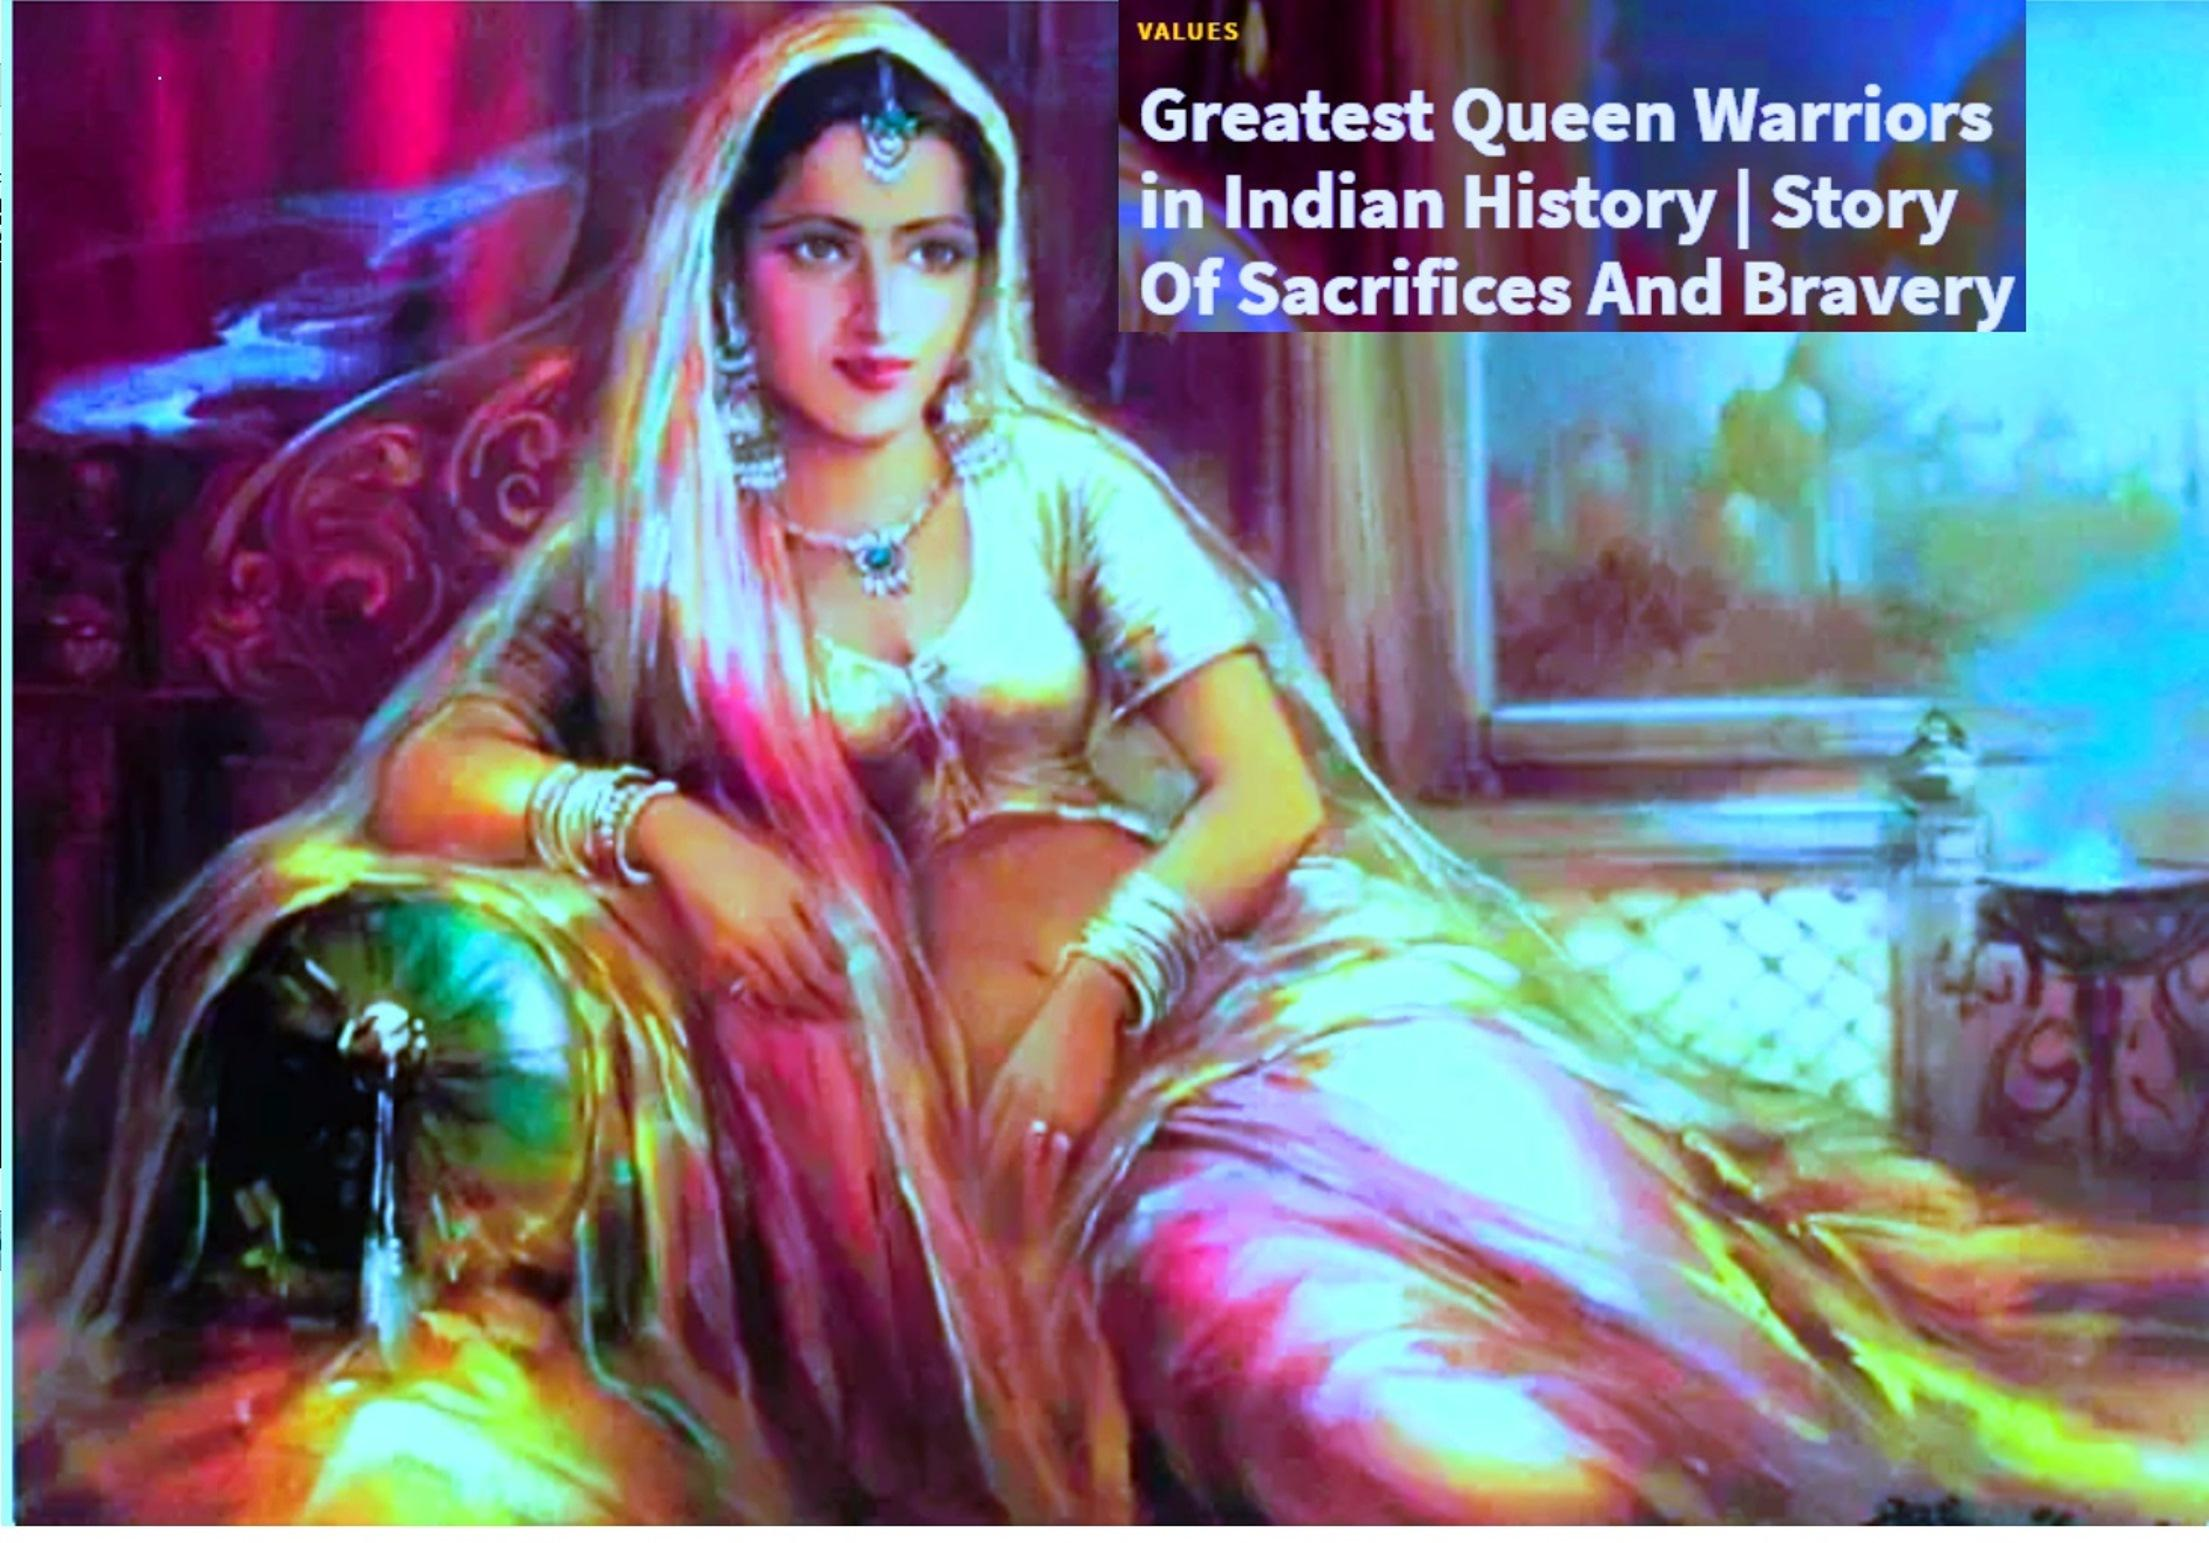 via_LocalCircles_Princess_Indians_warriors___20200727111540___.jpg